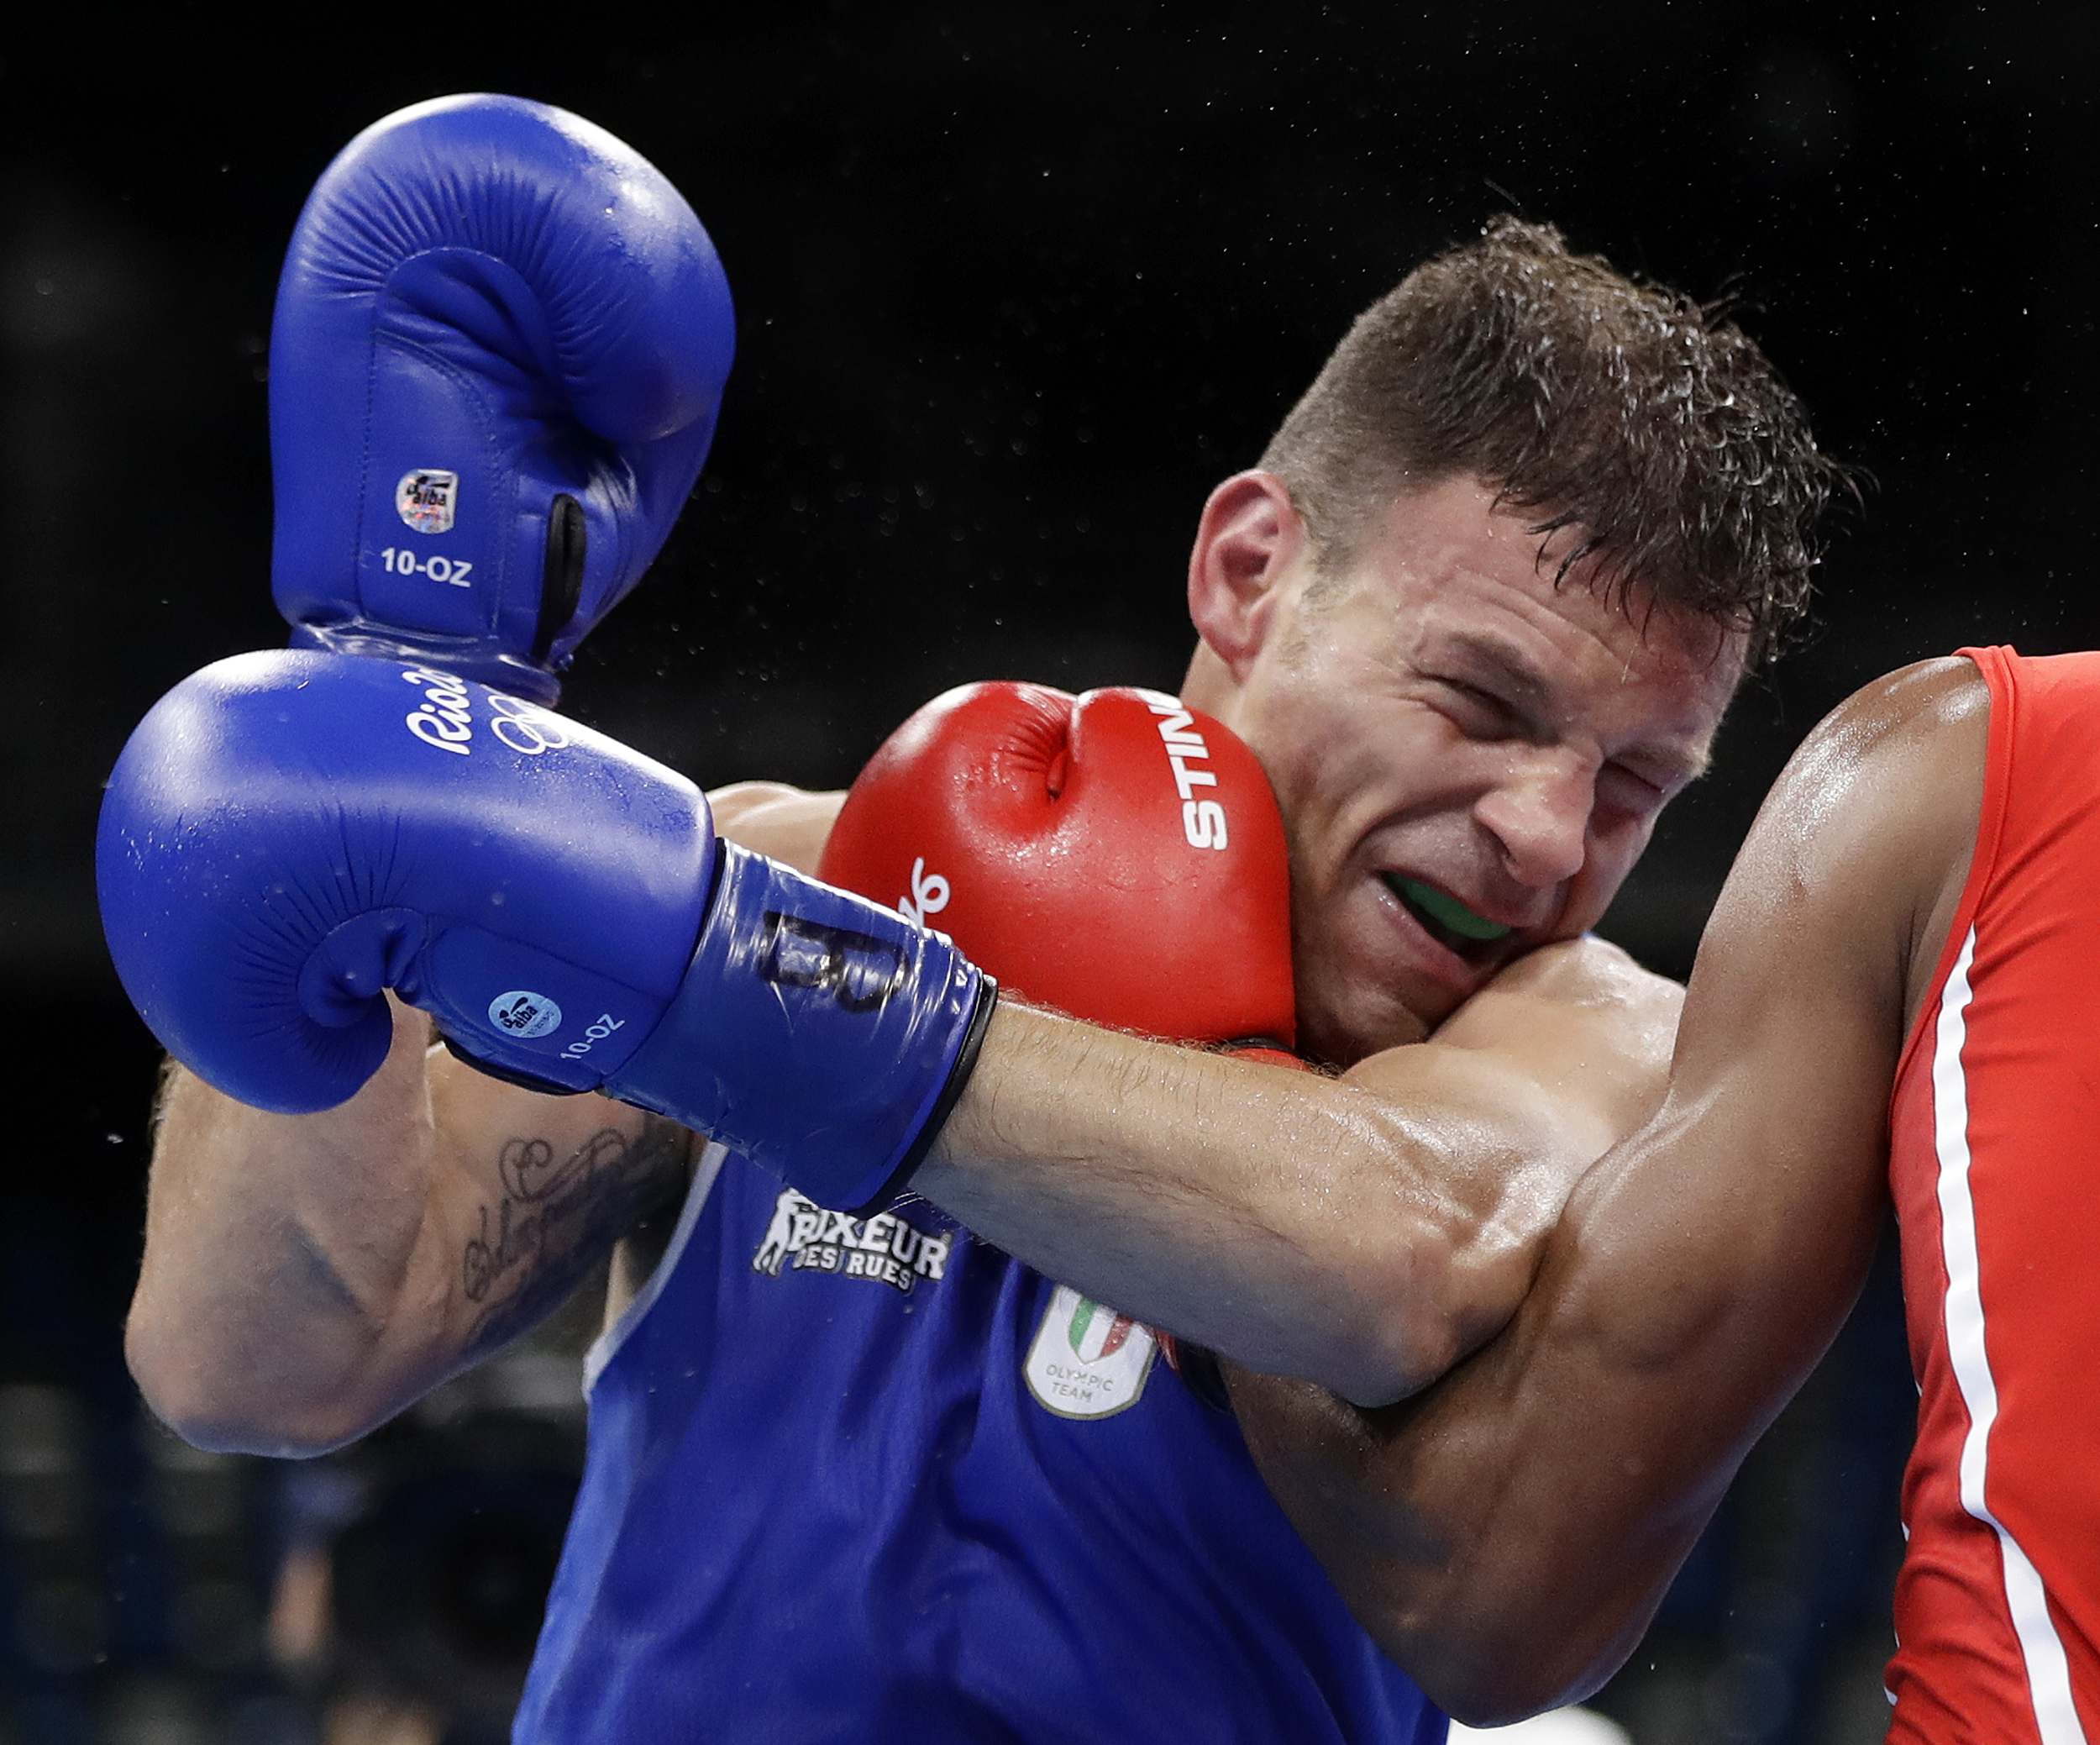 Italy's Carmine Tommasone fights Cuba's Lazaro Alvarez during a men's lightweight 60-kg preliminary boxing match at the 2016 Summer Olympics in Rio de Janeiro, Brazil, Tuesday, Aug. 9, 2016. (AP Photo/Frank Franklin II)